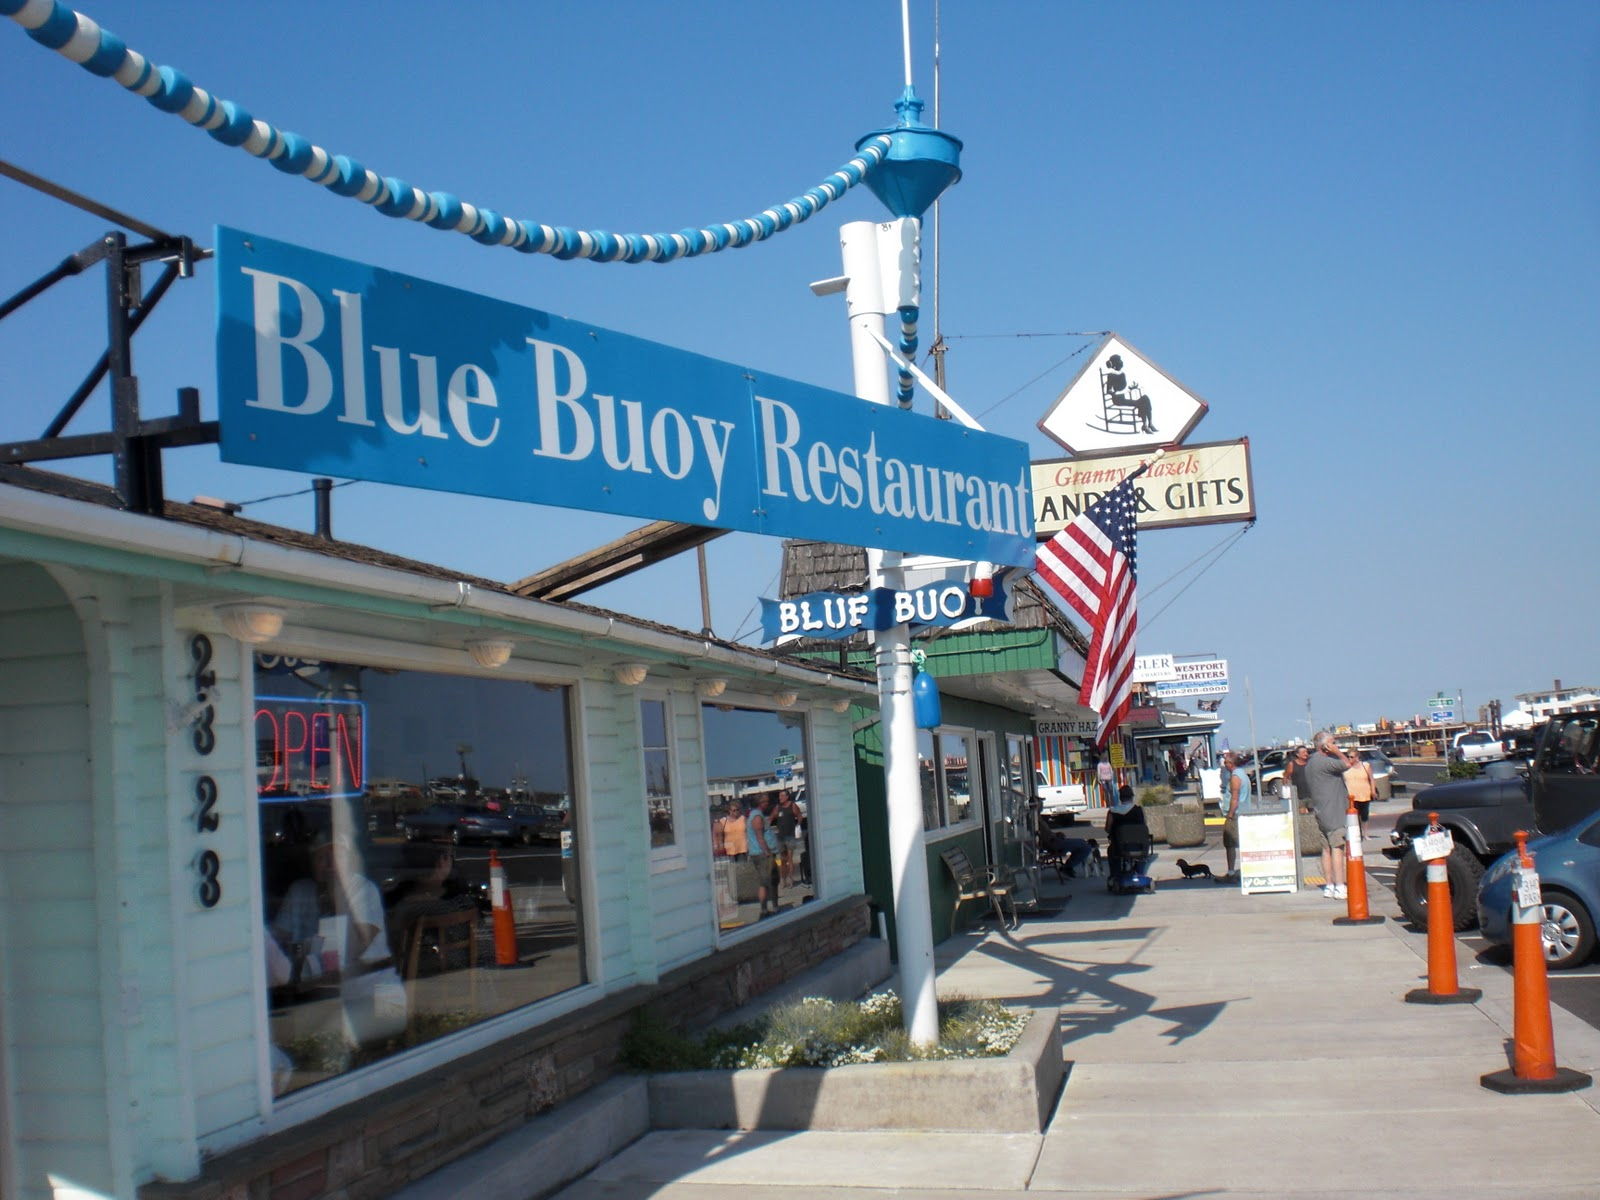 Review adventures blue buoy restaurant westport washington for The westport